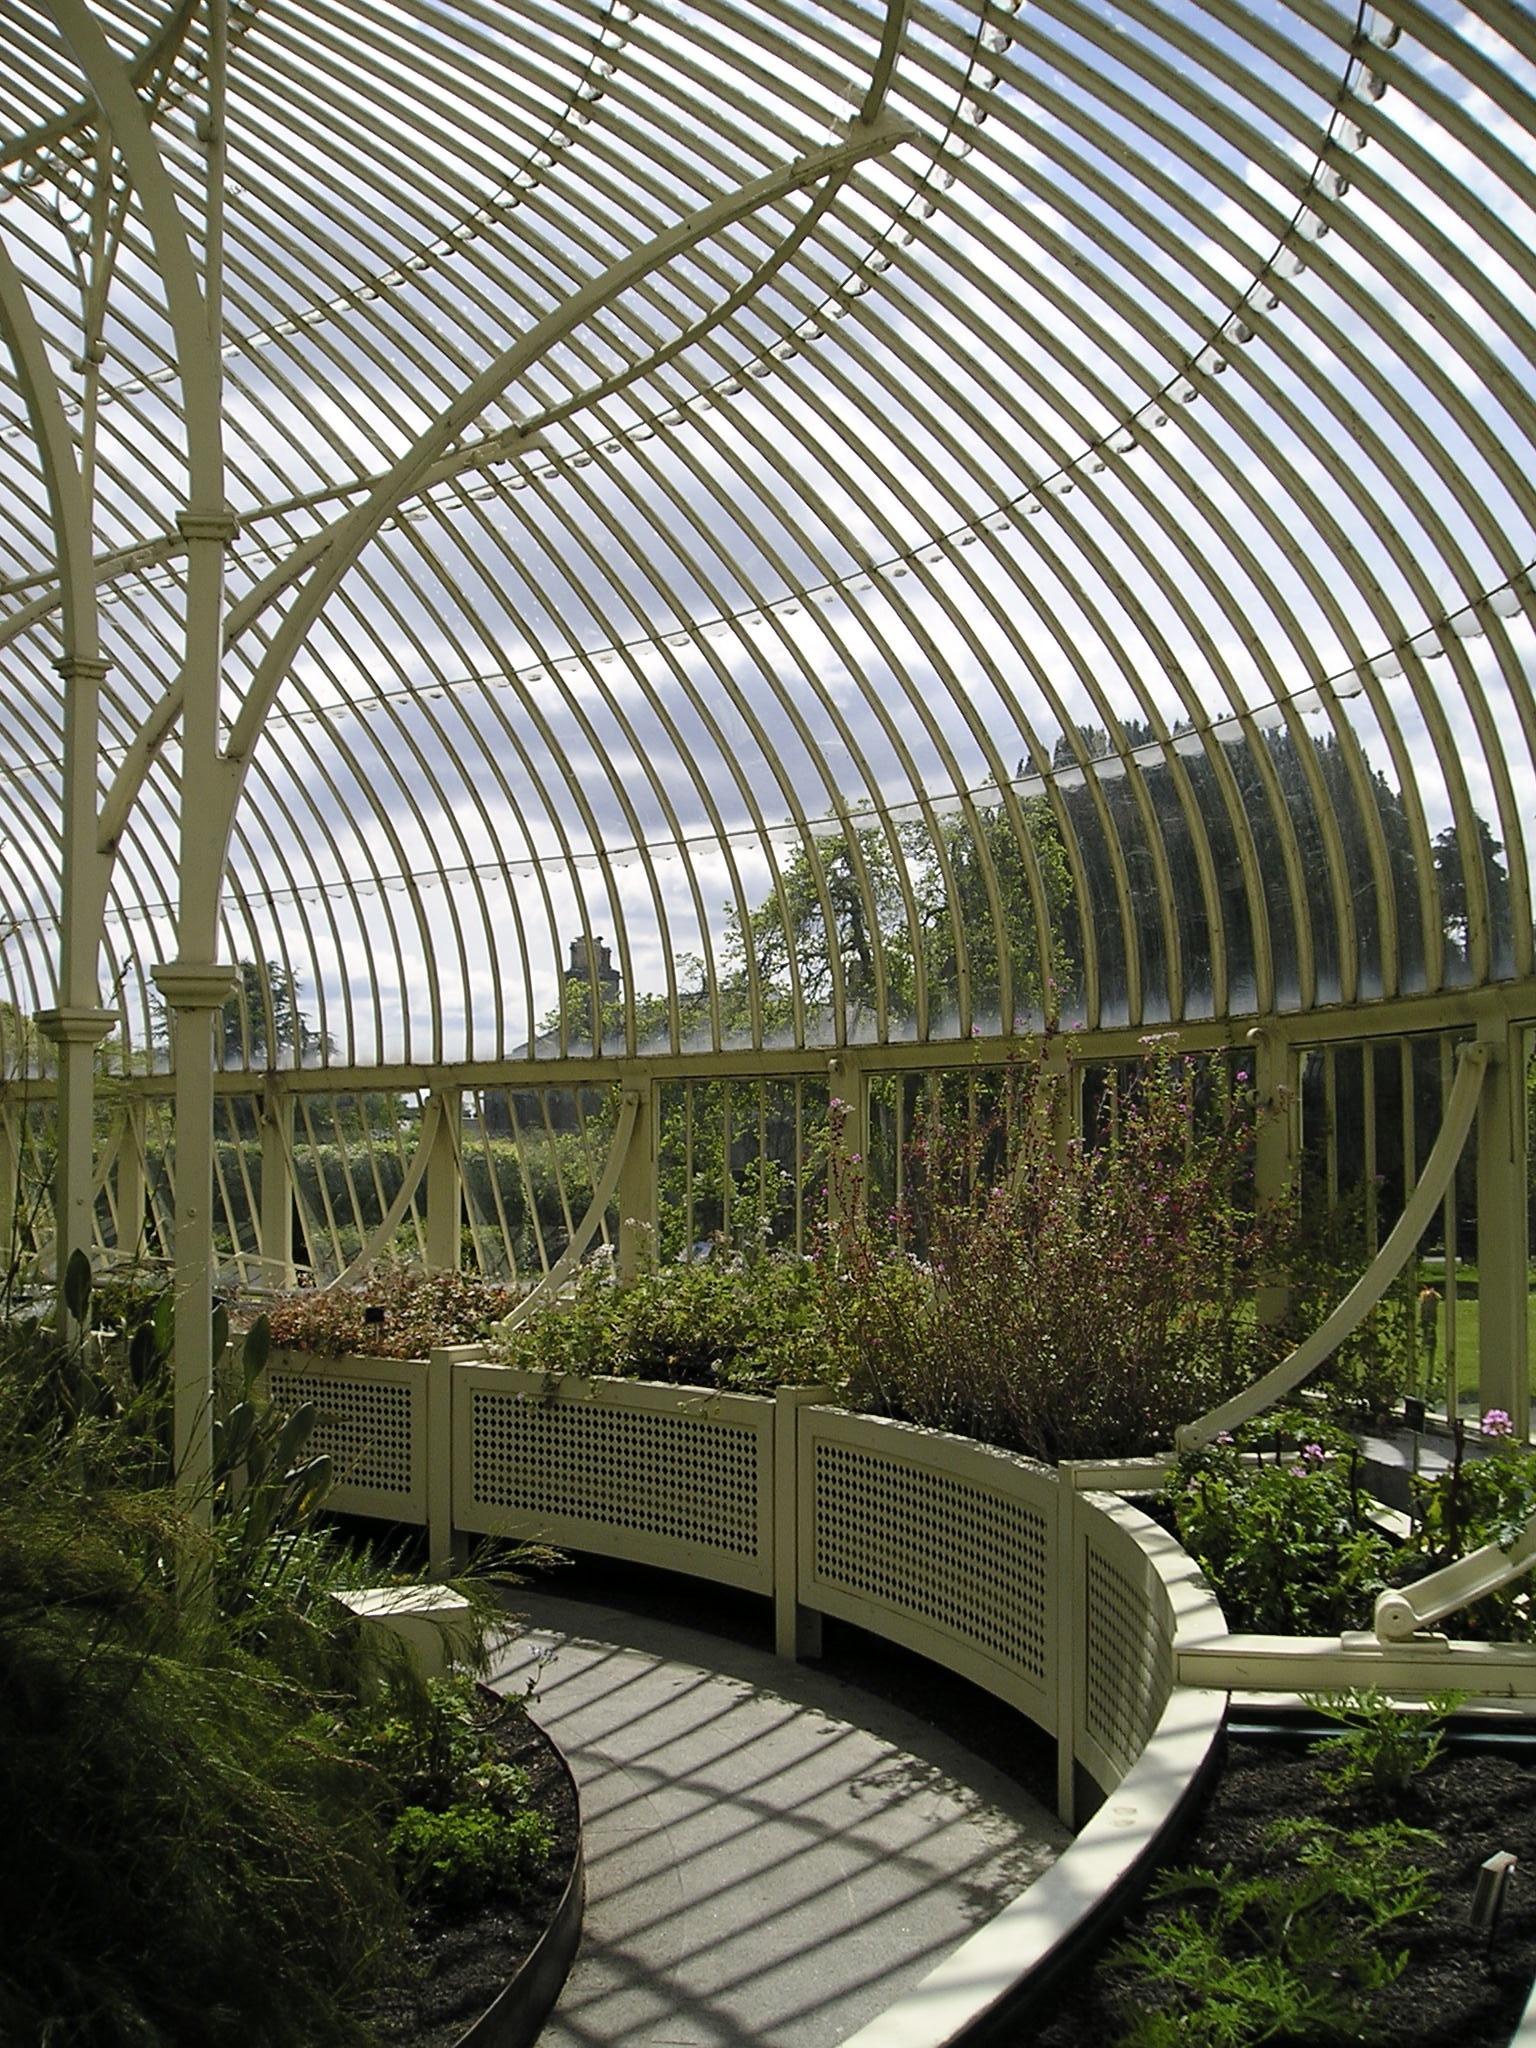 Family Hiatus: Sunday Drive: National Botanic Gardens Glasnevin